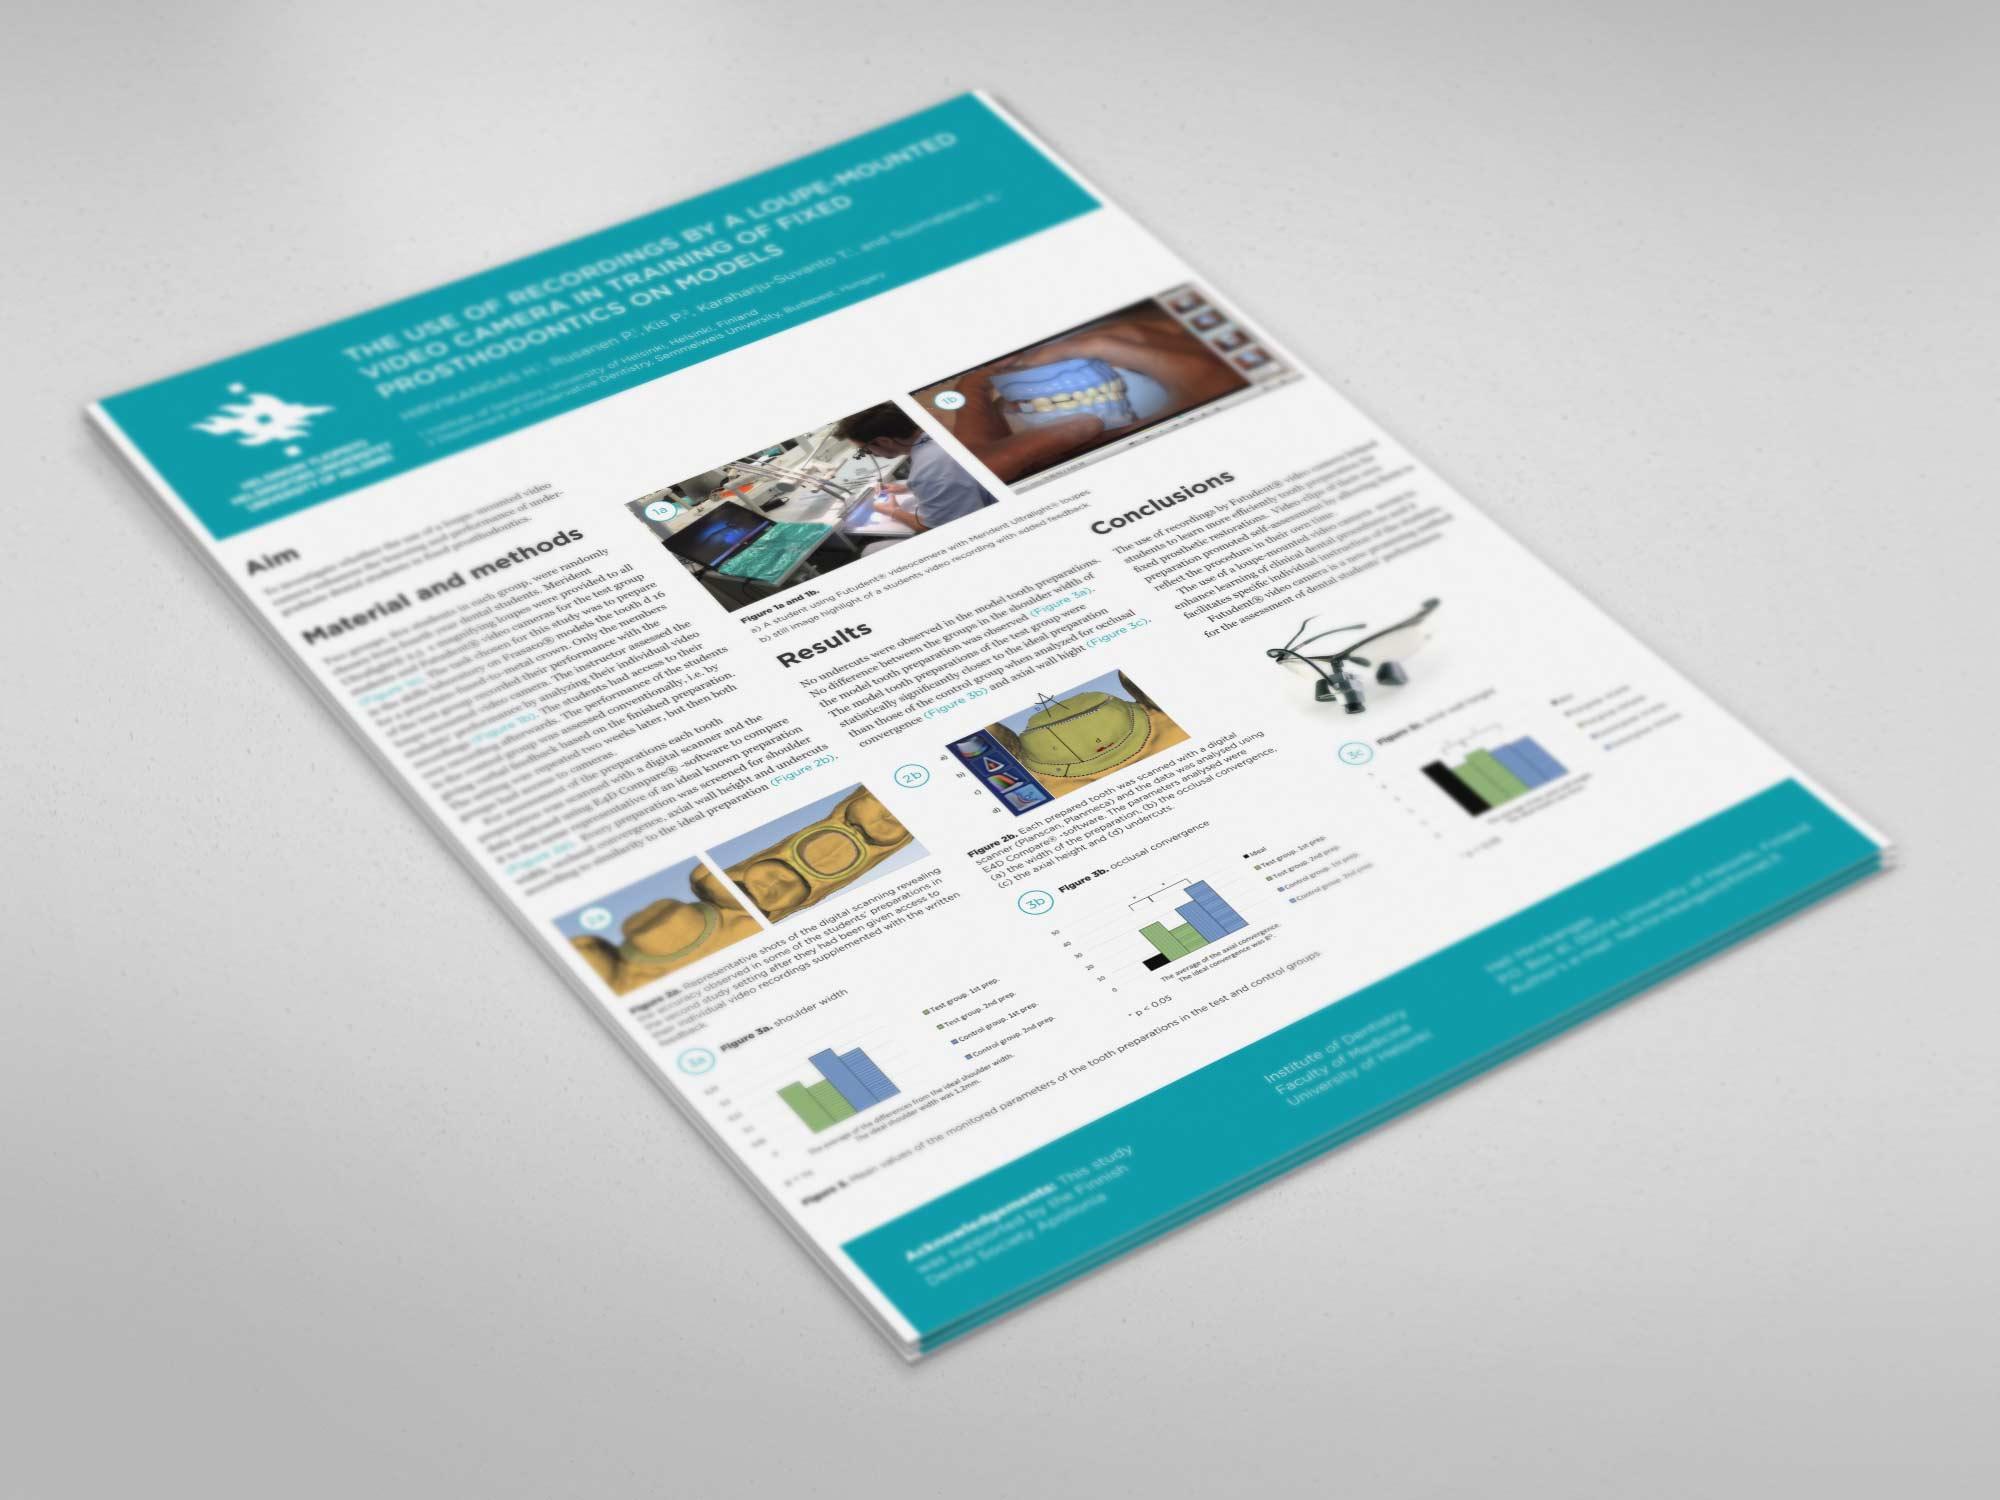 web_futudent-enhancing-research_pdf